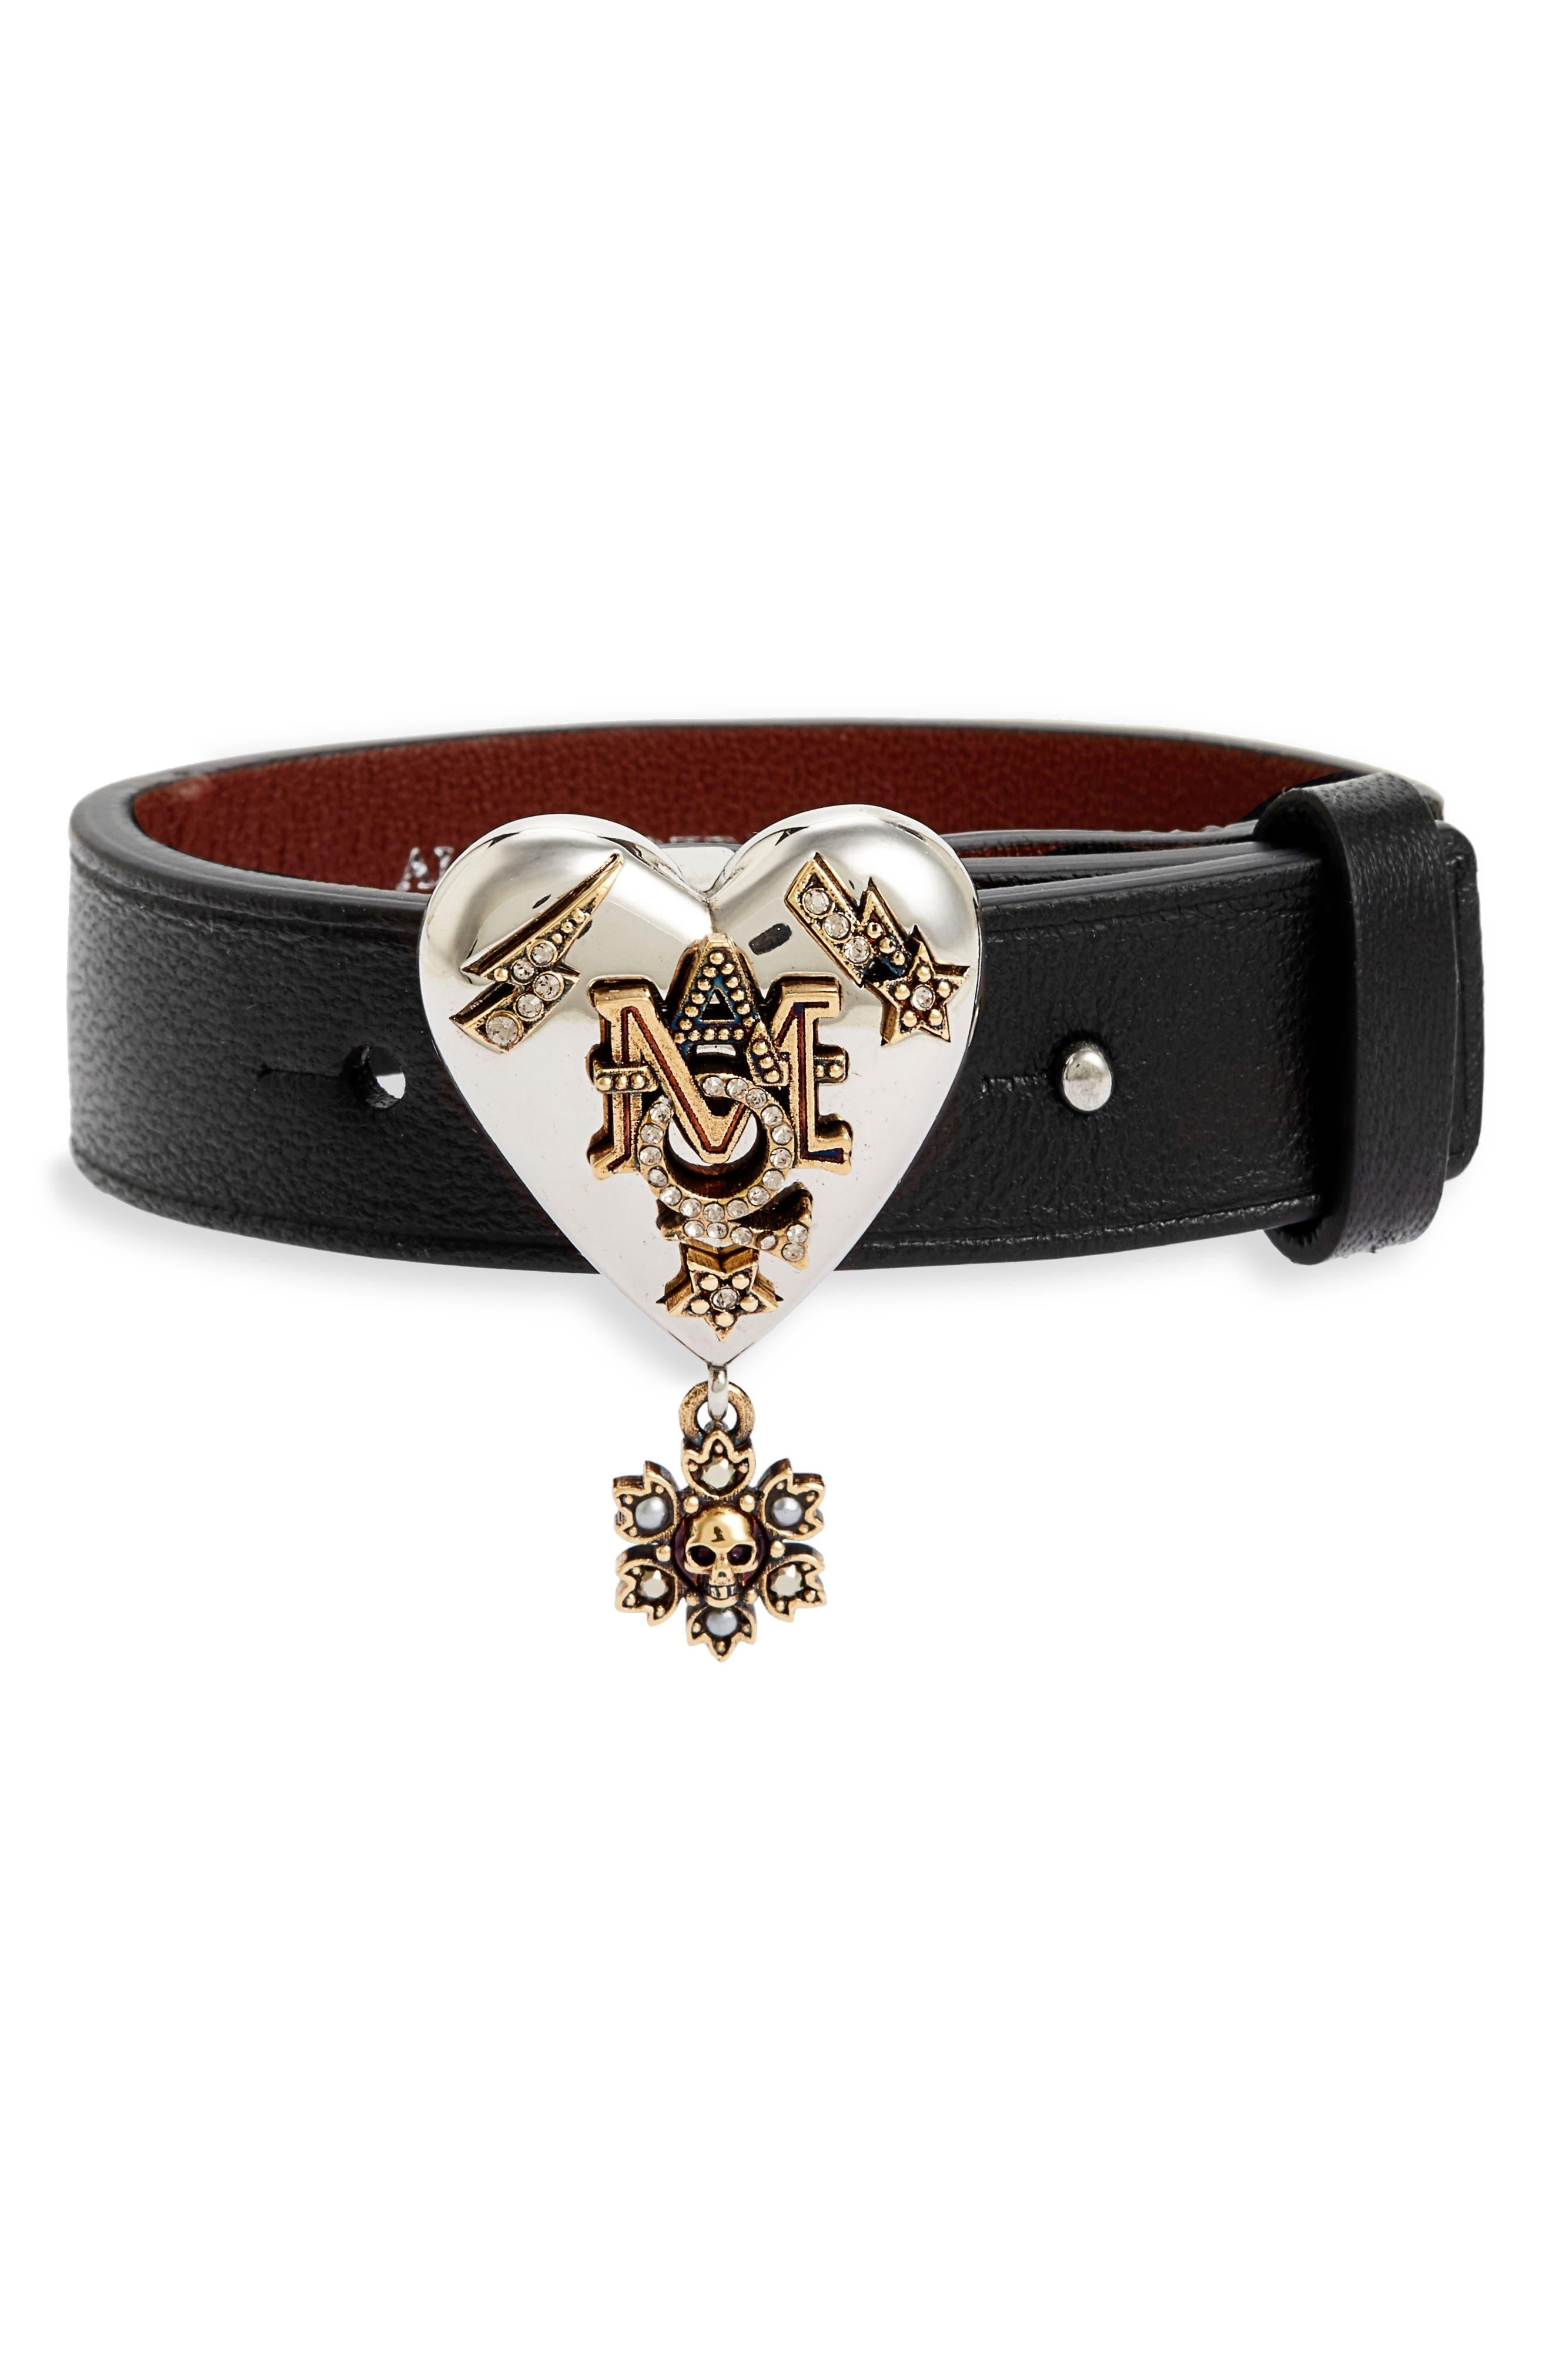 Alternate Image 1 Selected - Alexander McQueen Metallic Heart Leather Bracelet